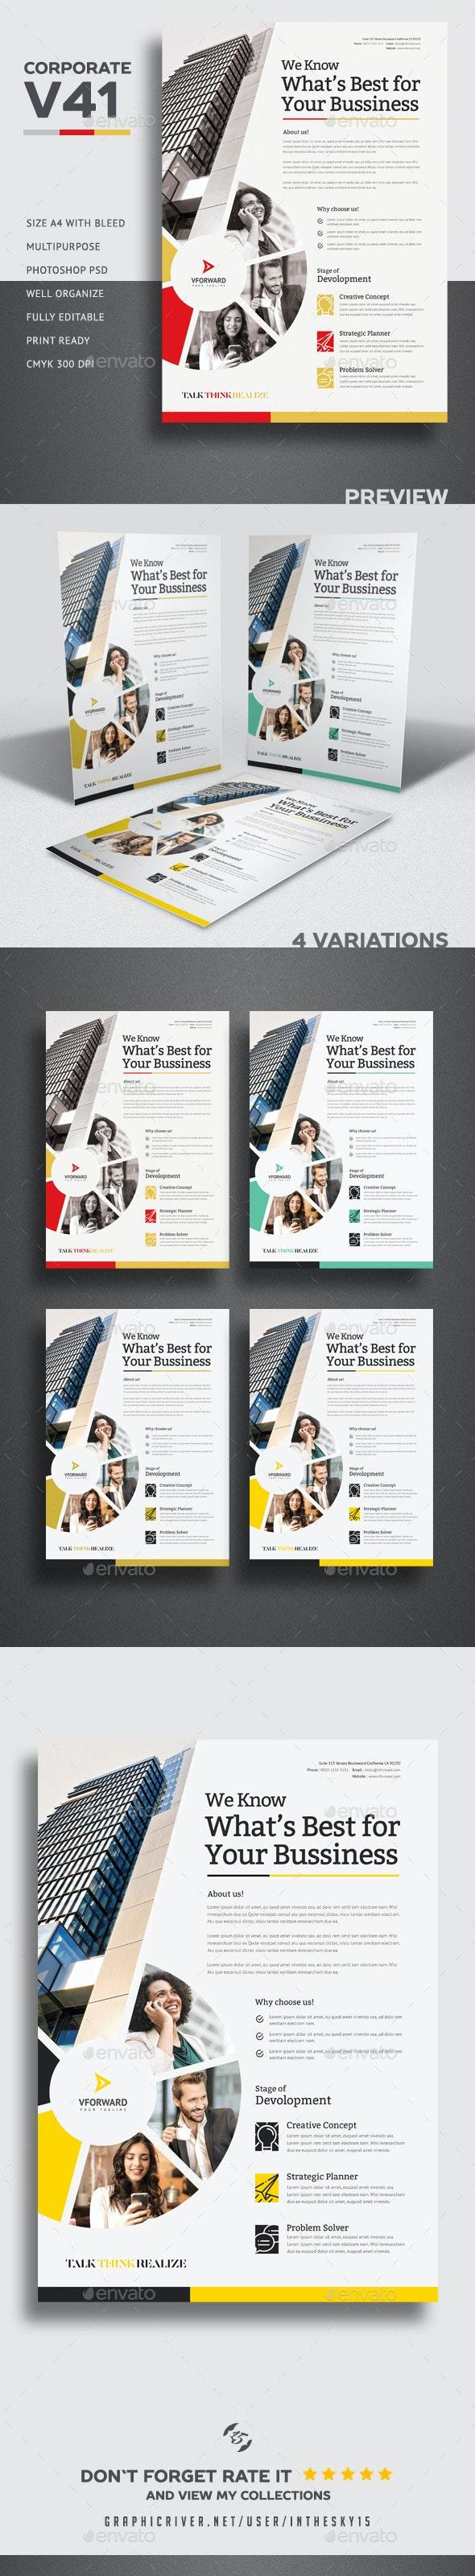 Corporate V41 Flyer - Flyers Print Templates